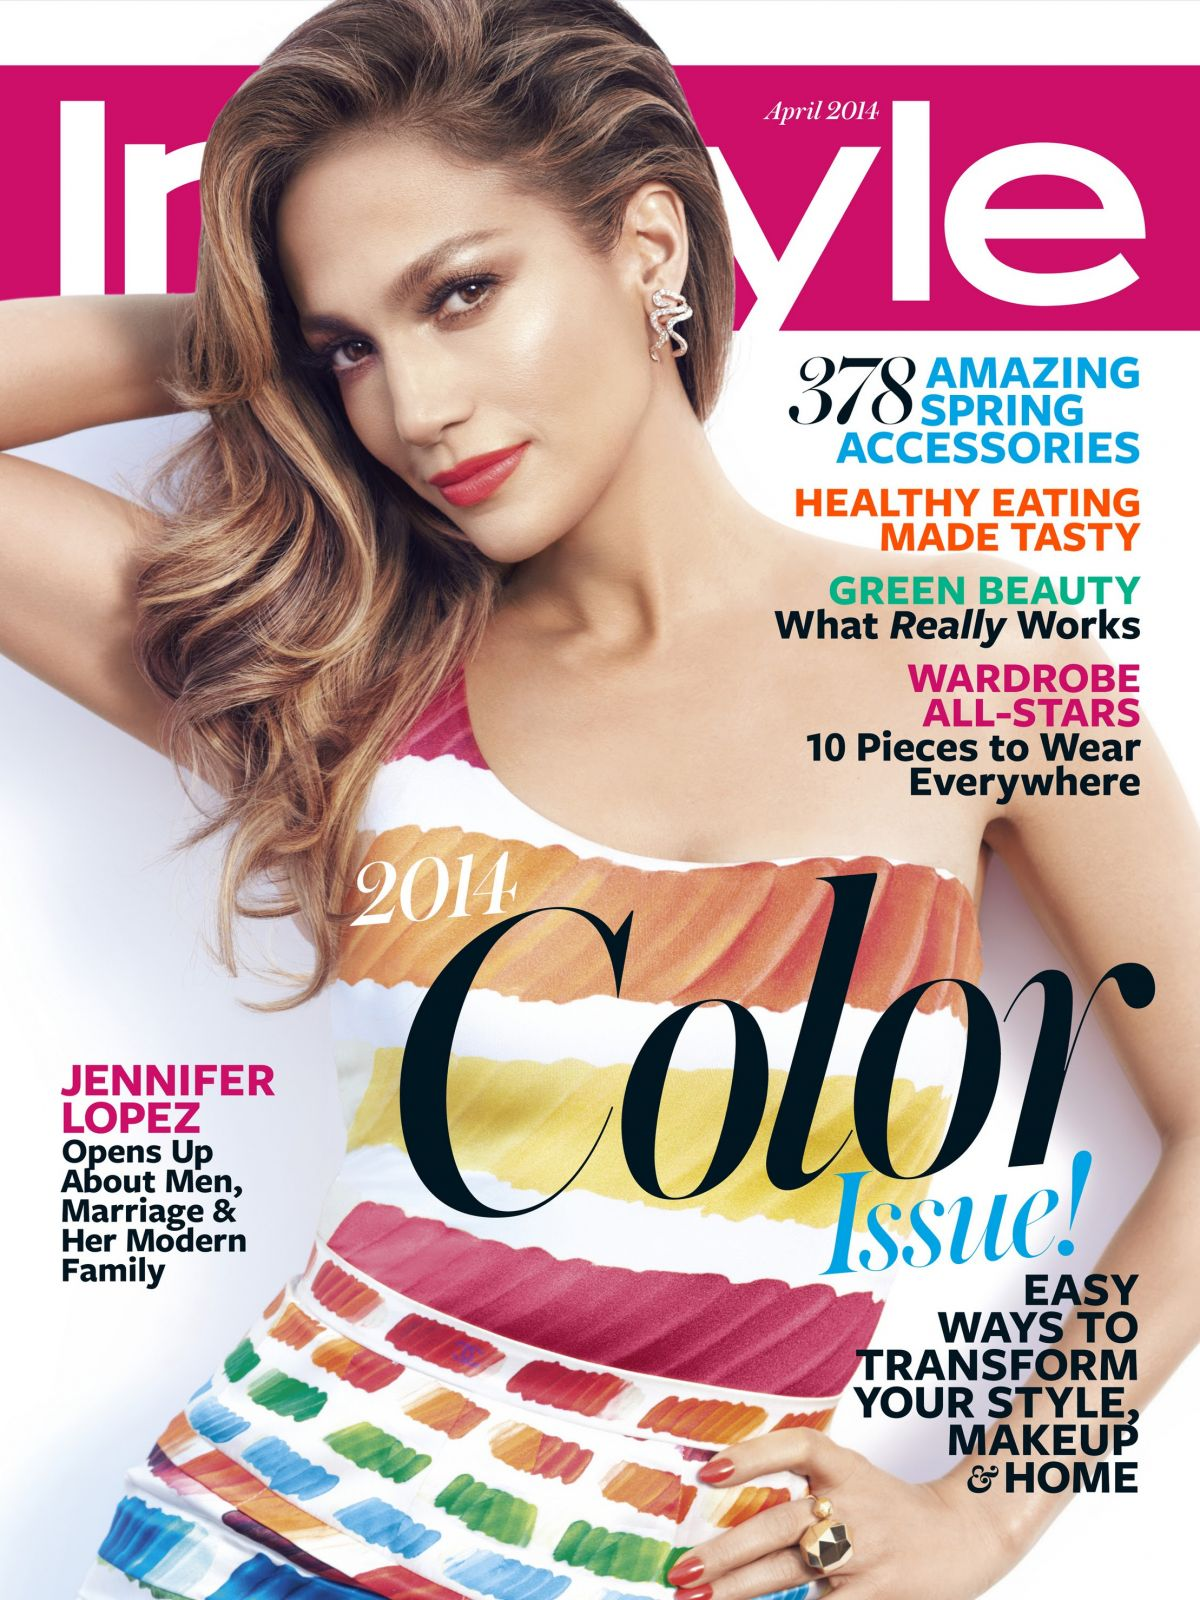 JENNIFER LOPEZ in Instyle Magazine, April 2014 Issue